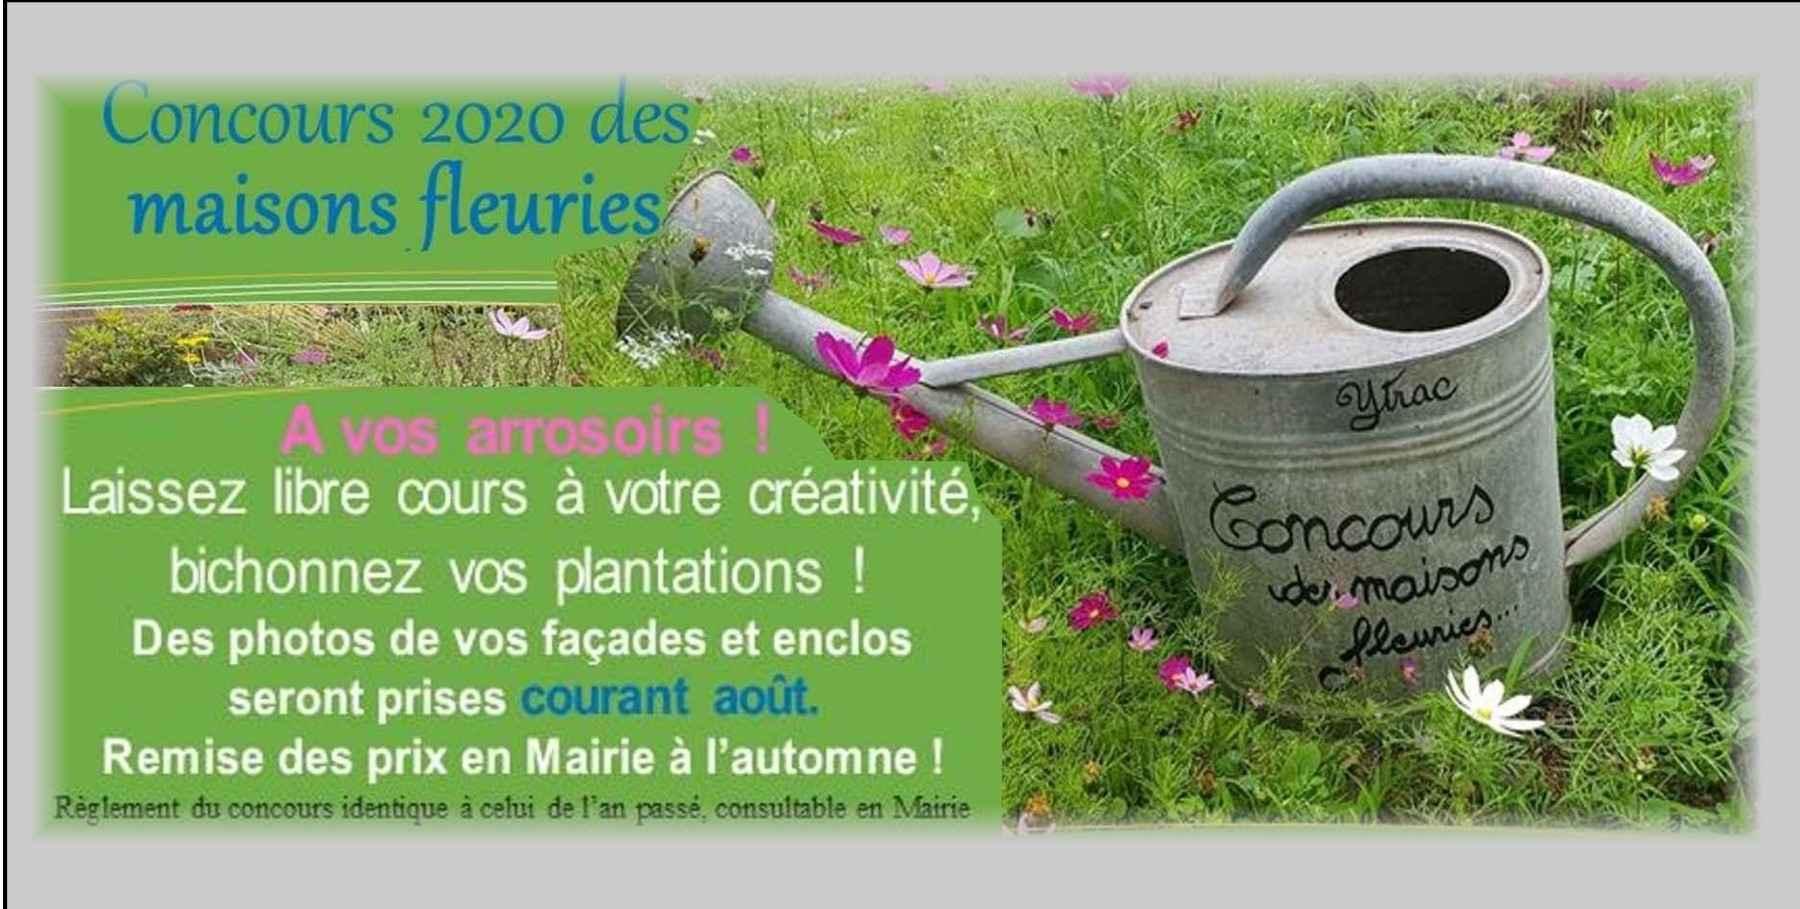 Masions fleuries2020